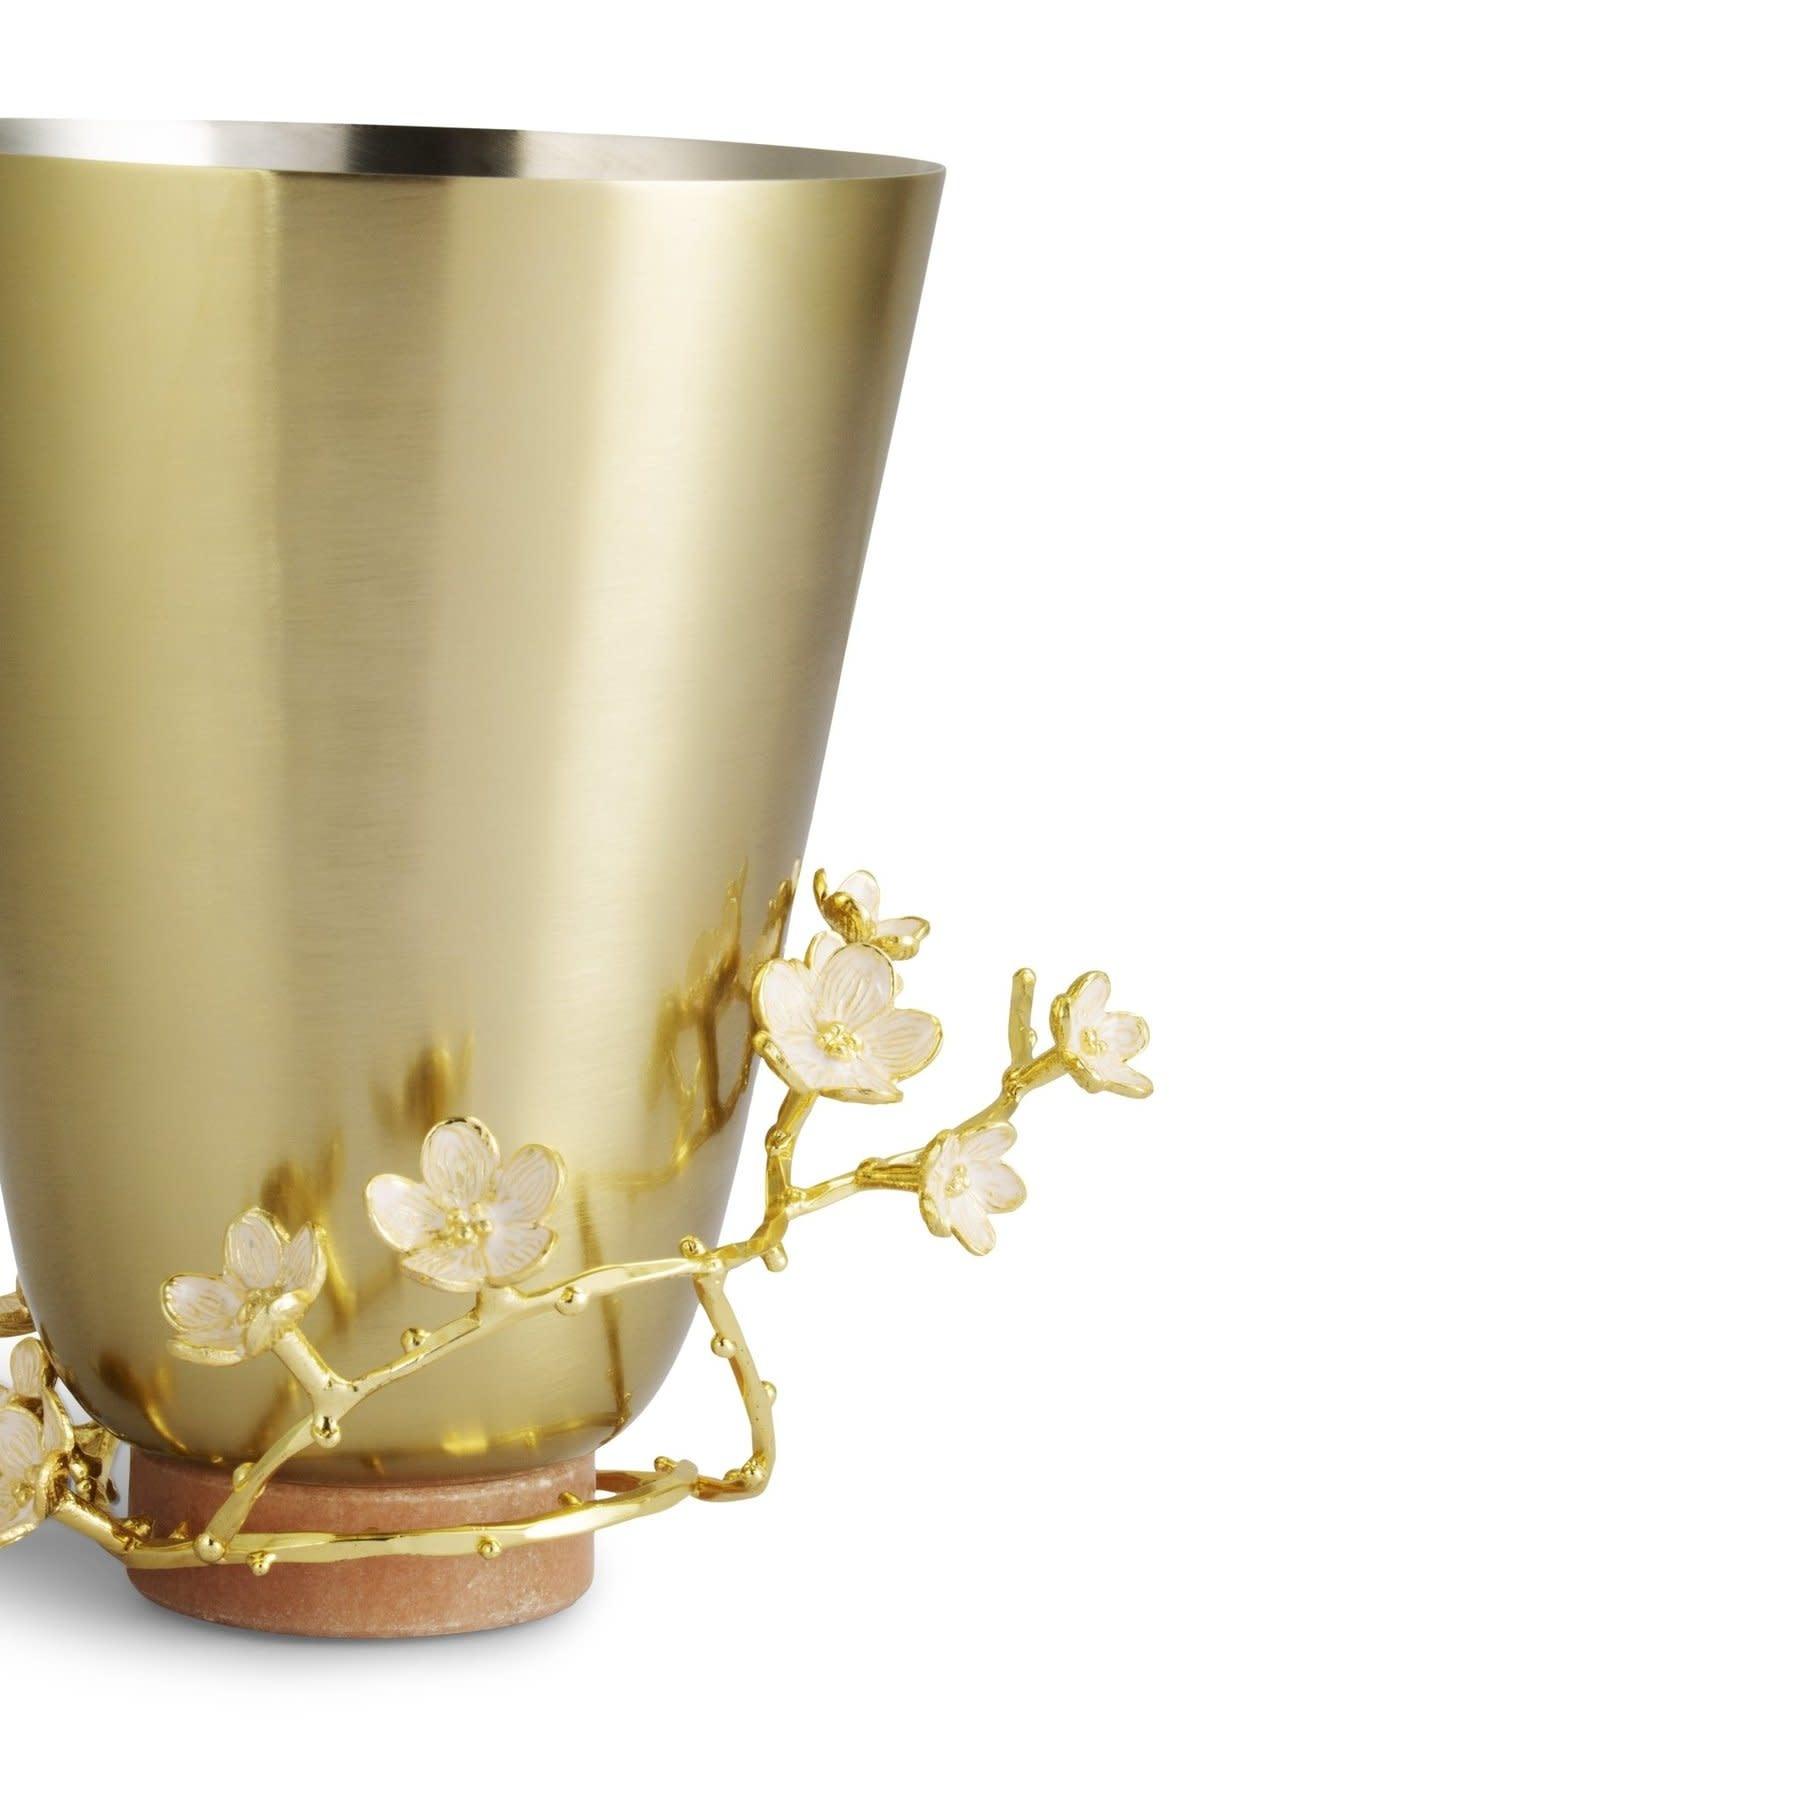 Michael Aram Cherry Blossom Vase